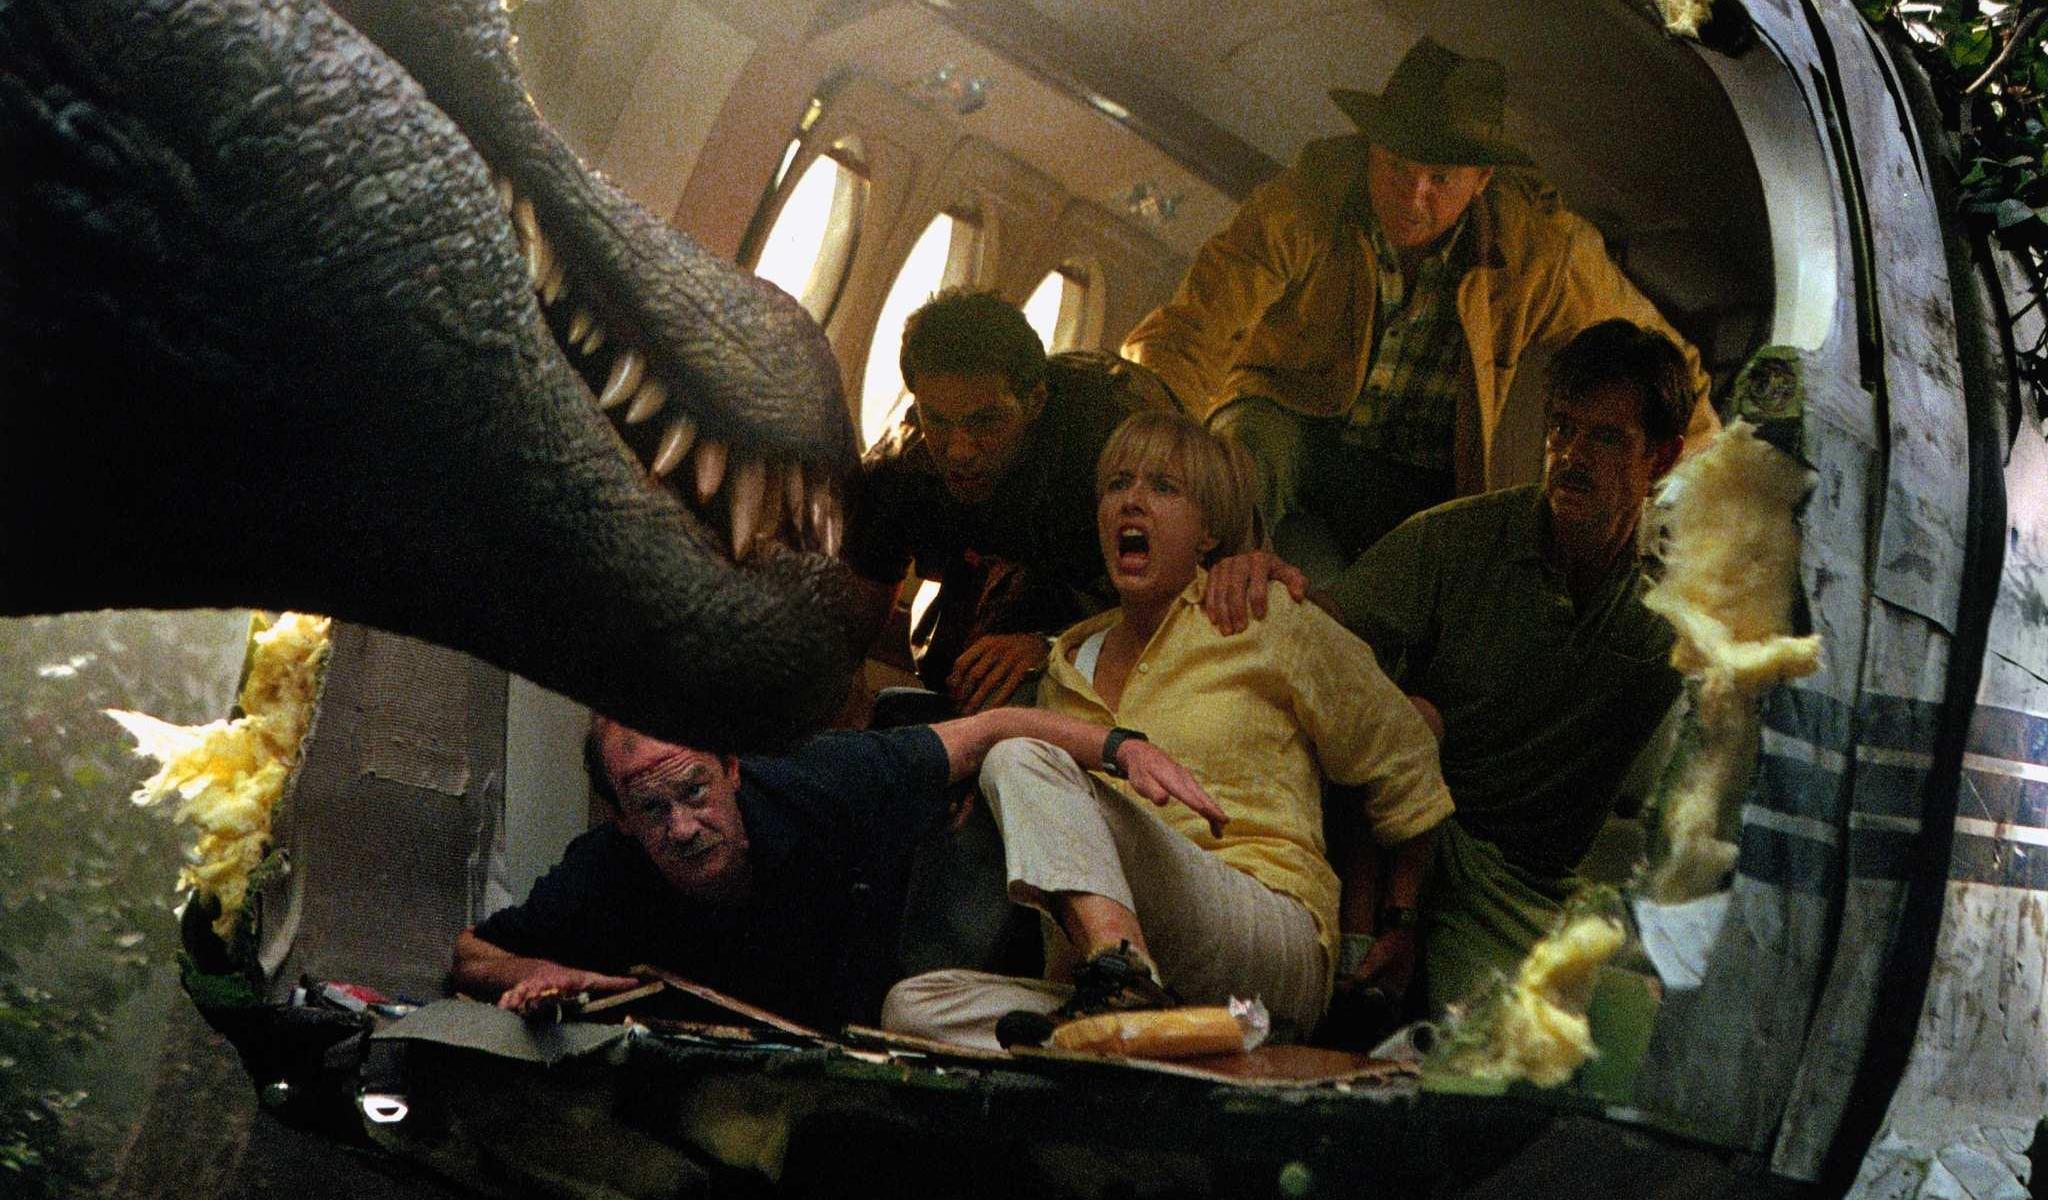 Michael Jeter, Alessandro Nivola, Téa Leoni, Sam Neill and William H. Macy in Jurassic Park III (2001)